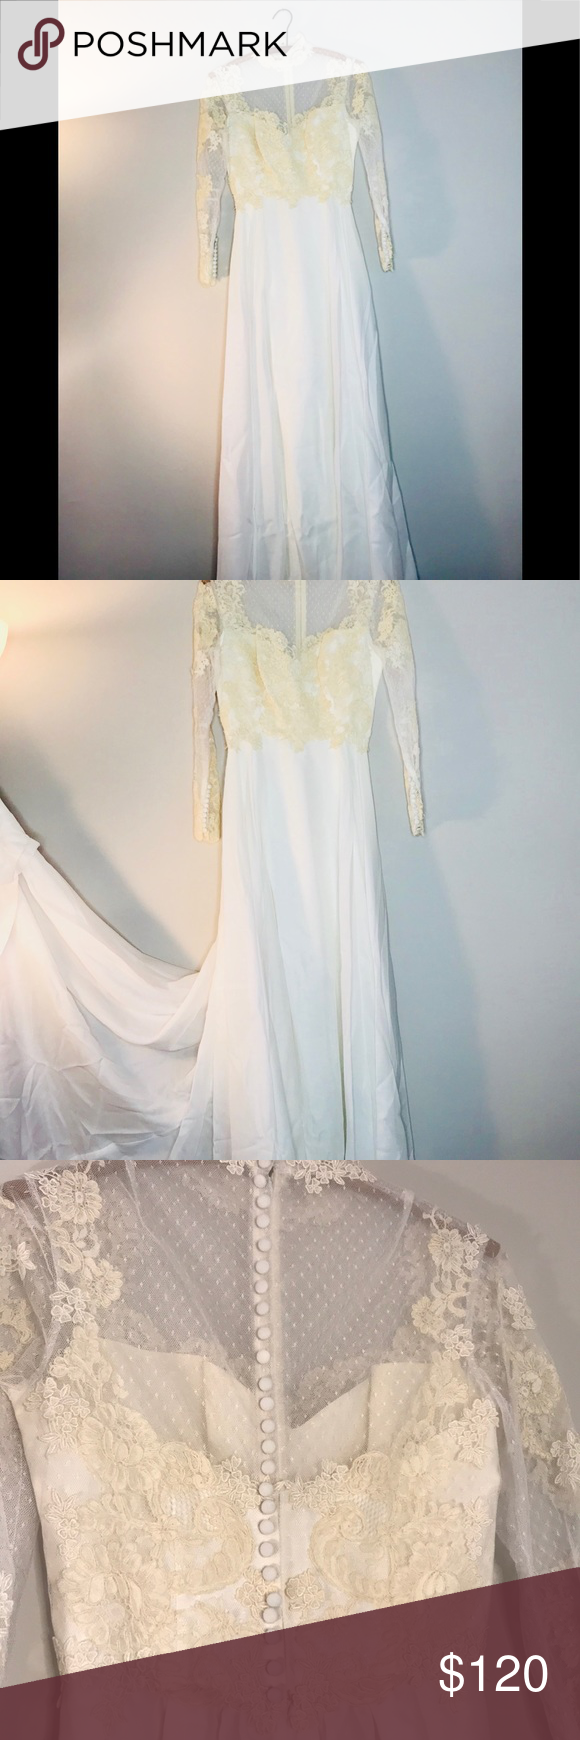 60s lace wedding dress  Vintage Retro us us Lace Wedding Dress  My Posh Picks